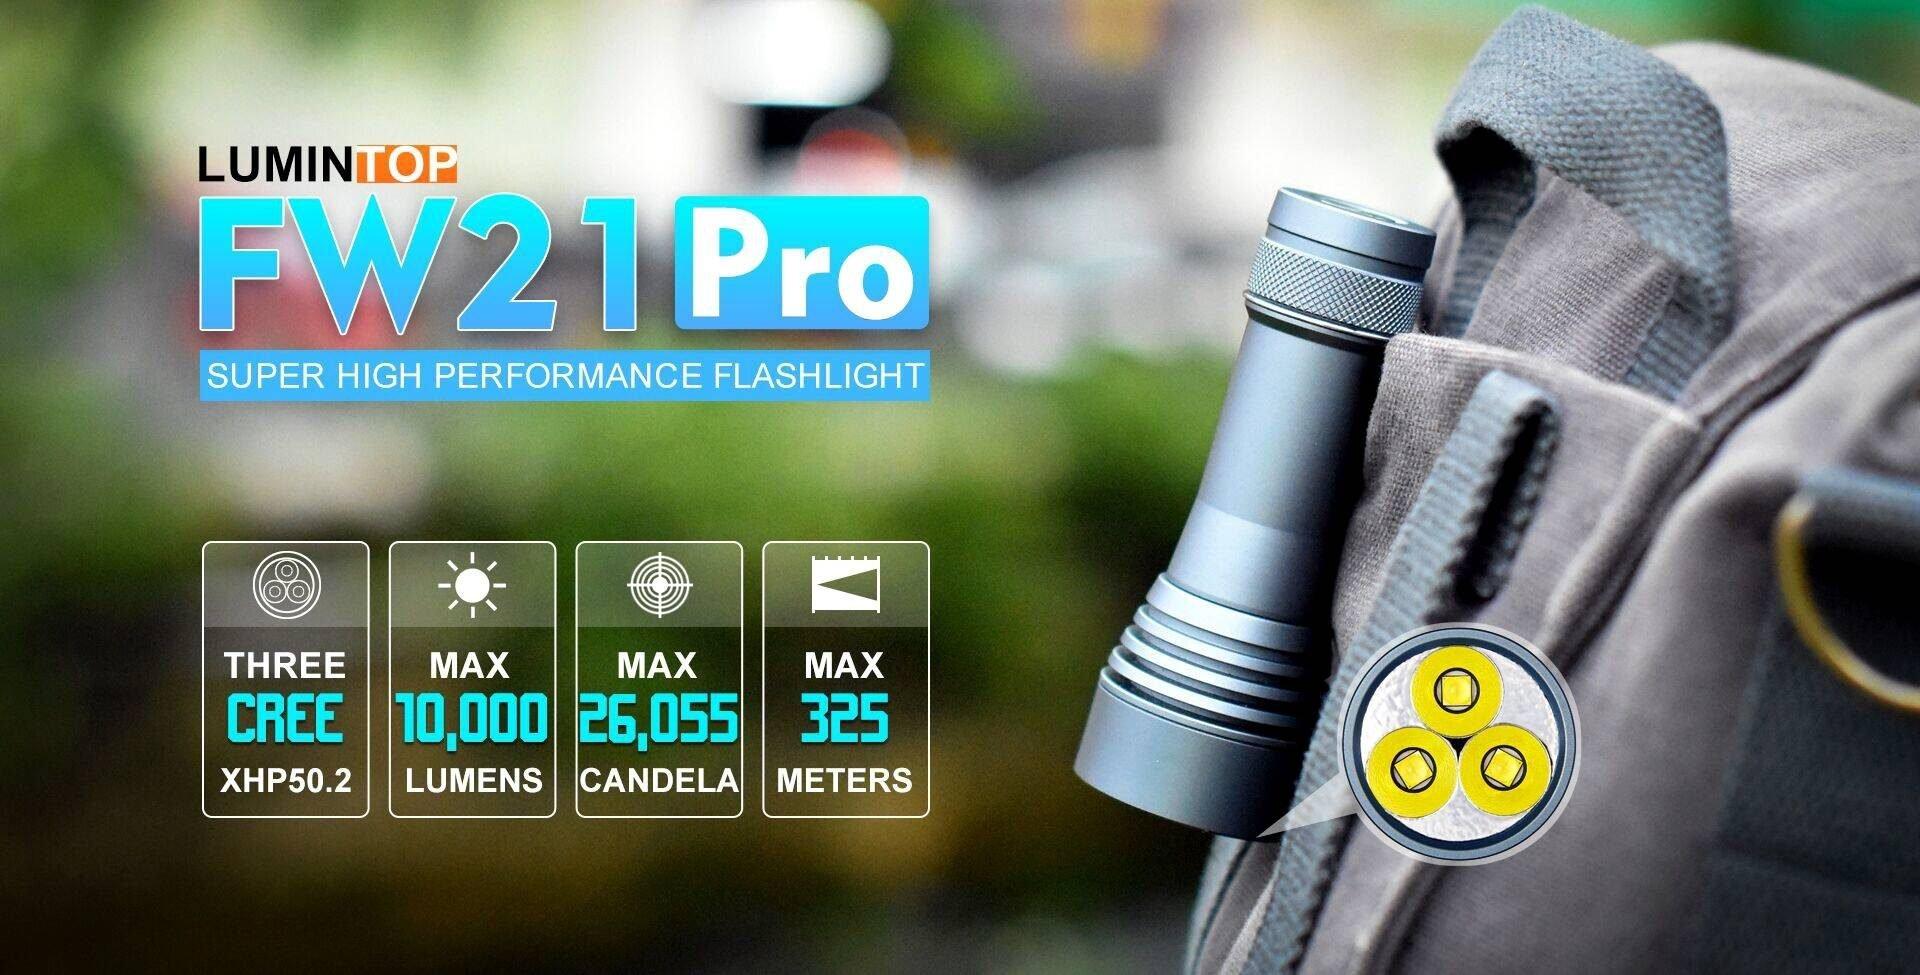 FW21 Pro